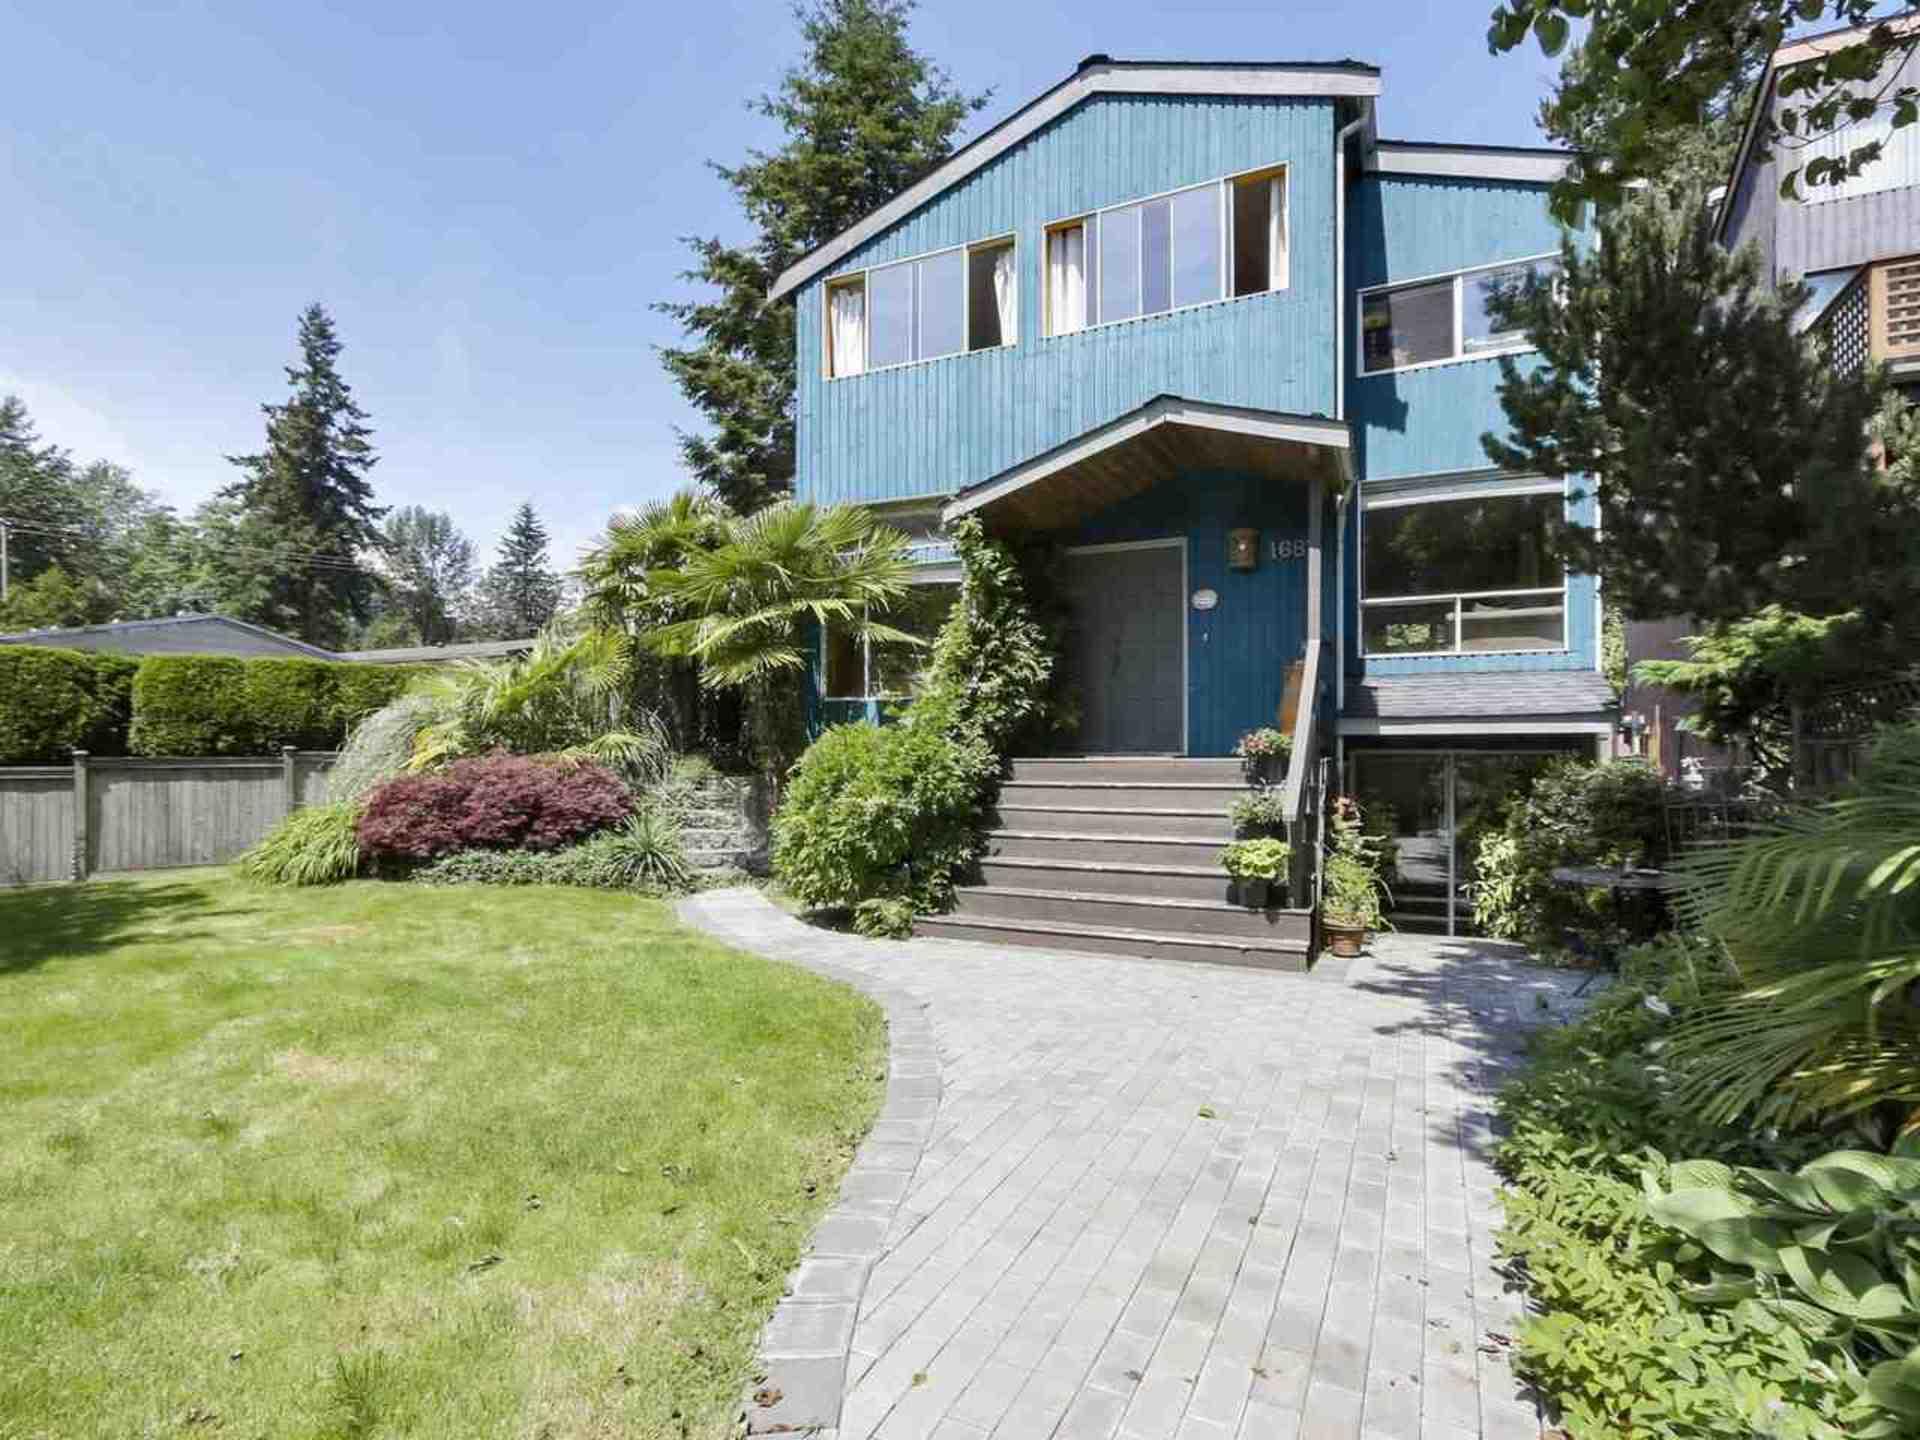 1682-w-21st-street-pemberton-nv-north-vancouver-01 at 1682 W 21st Street, Pemberton NV, North Vancouver